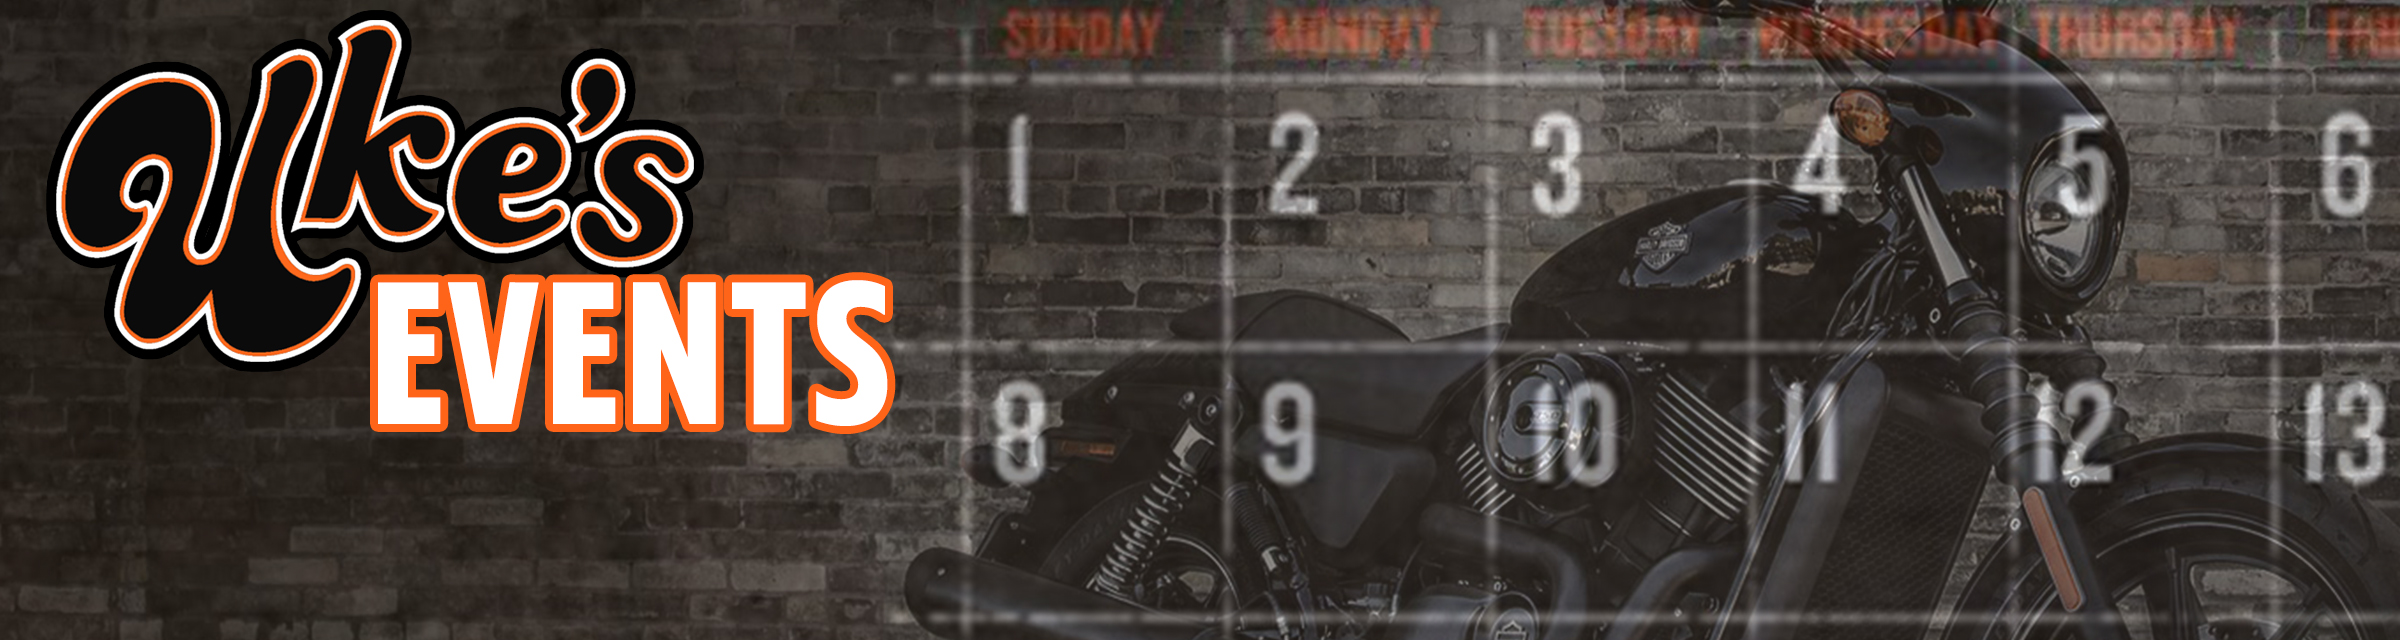 Harley-Davidson<sup>&reg;</sup> Events